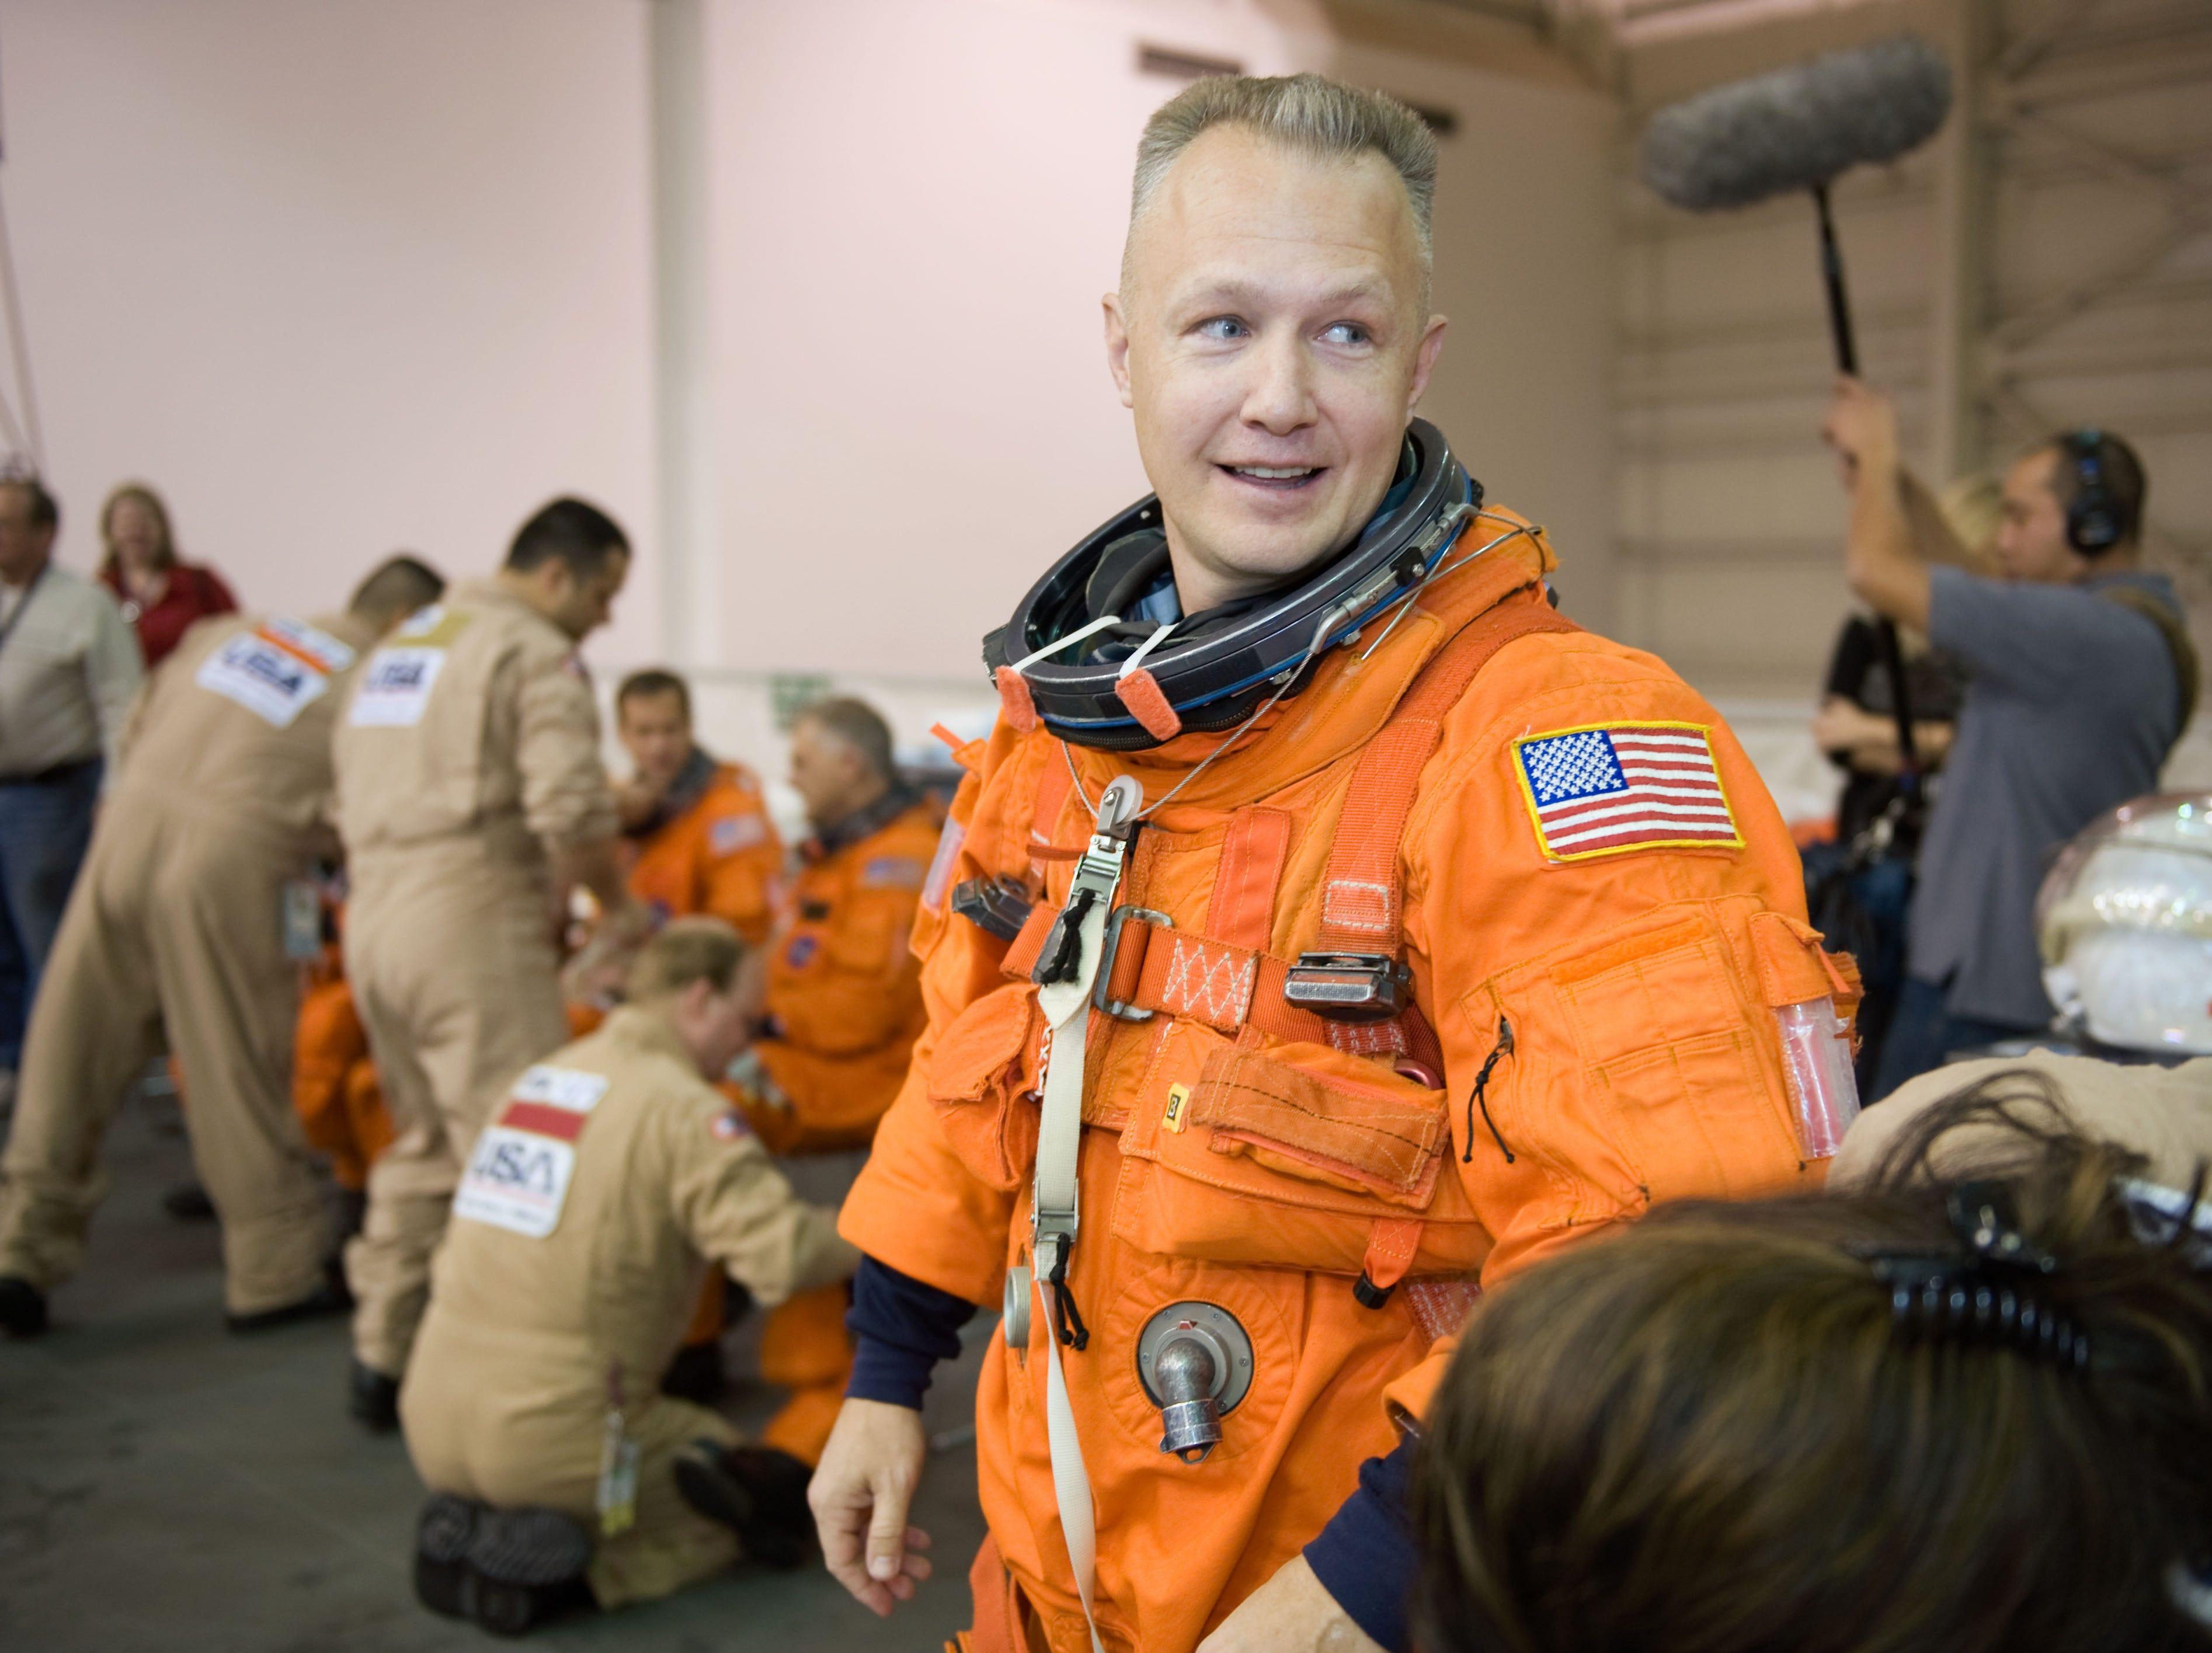 Endicott native , Owego Free Academy graduate and NASA astronaut Marine Corps. Lt Col. Douglas G. Hurley.